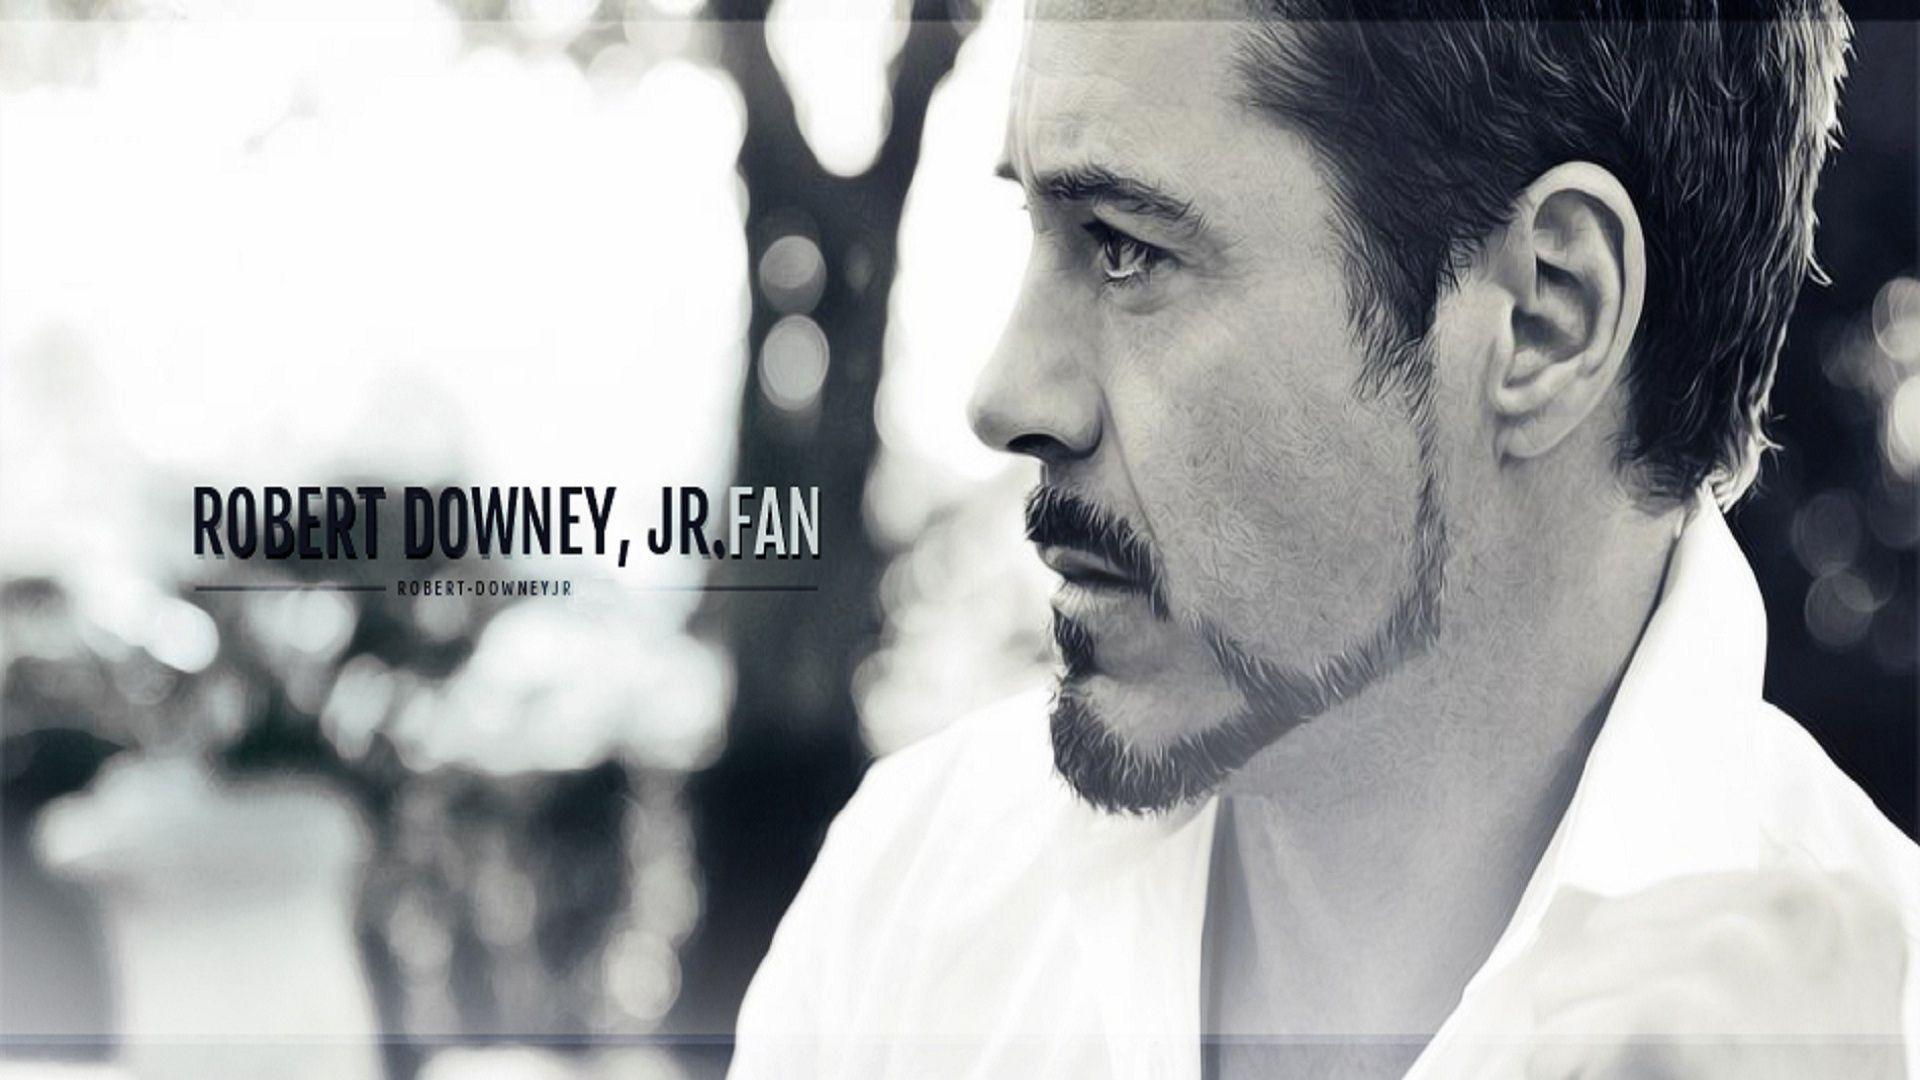 Robert Downey Jr Top Hollywood Actor Hd Wallpapers 1080p Robert